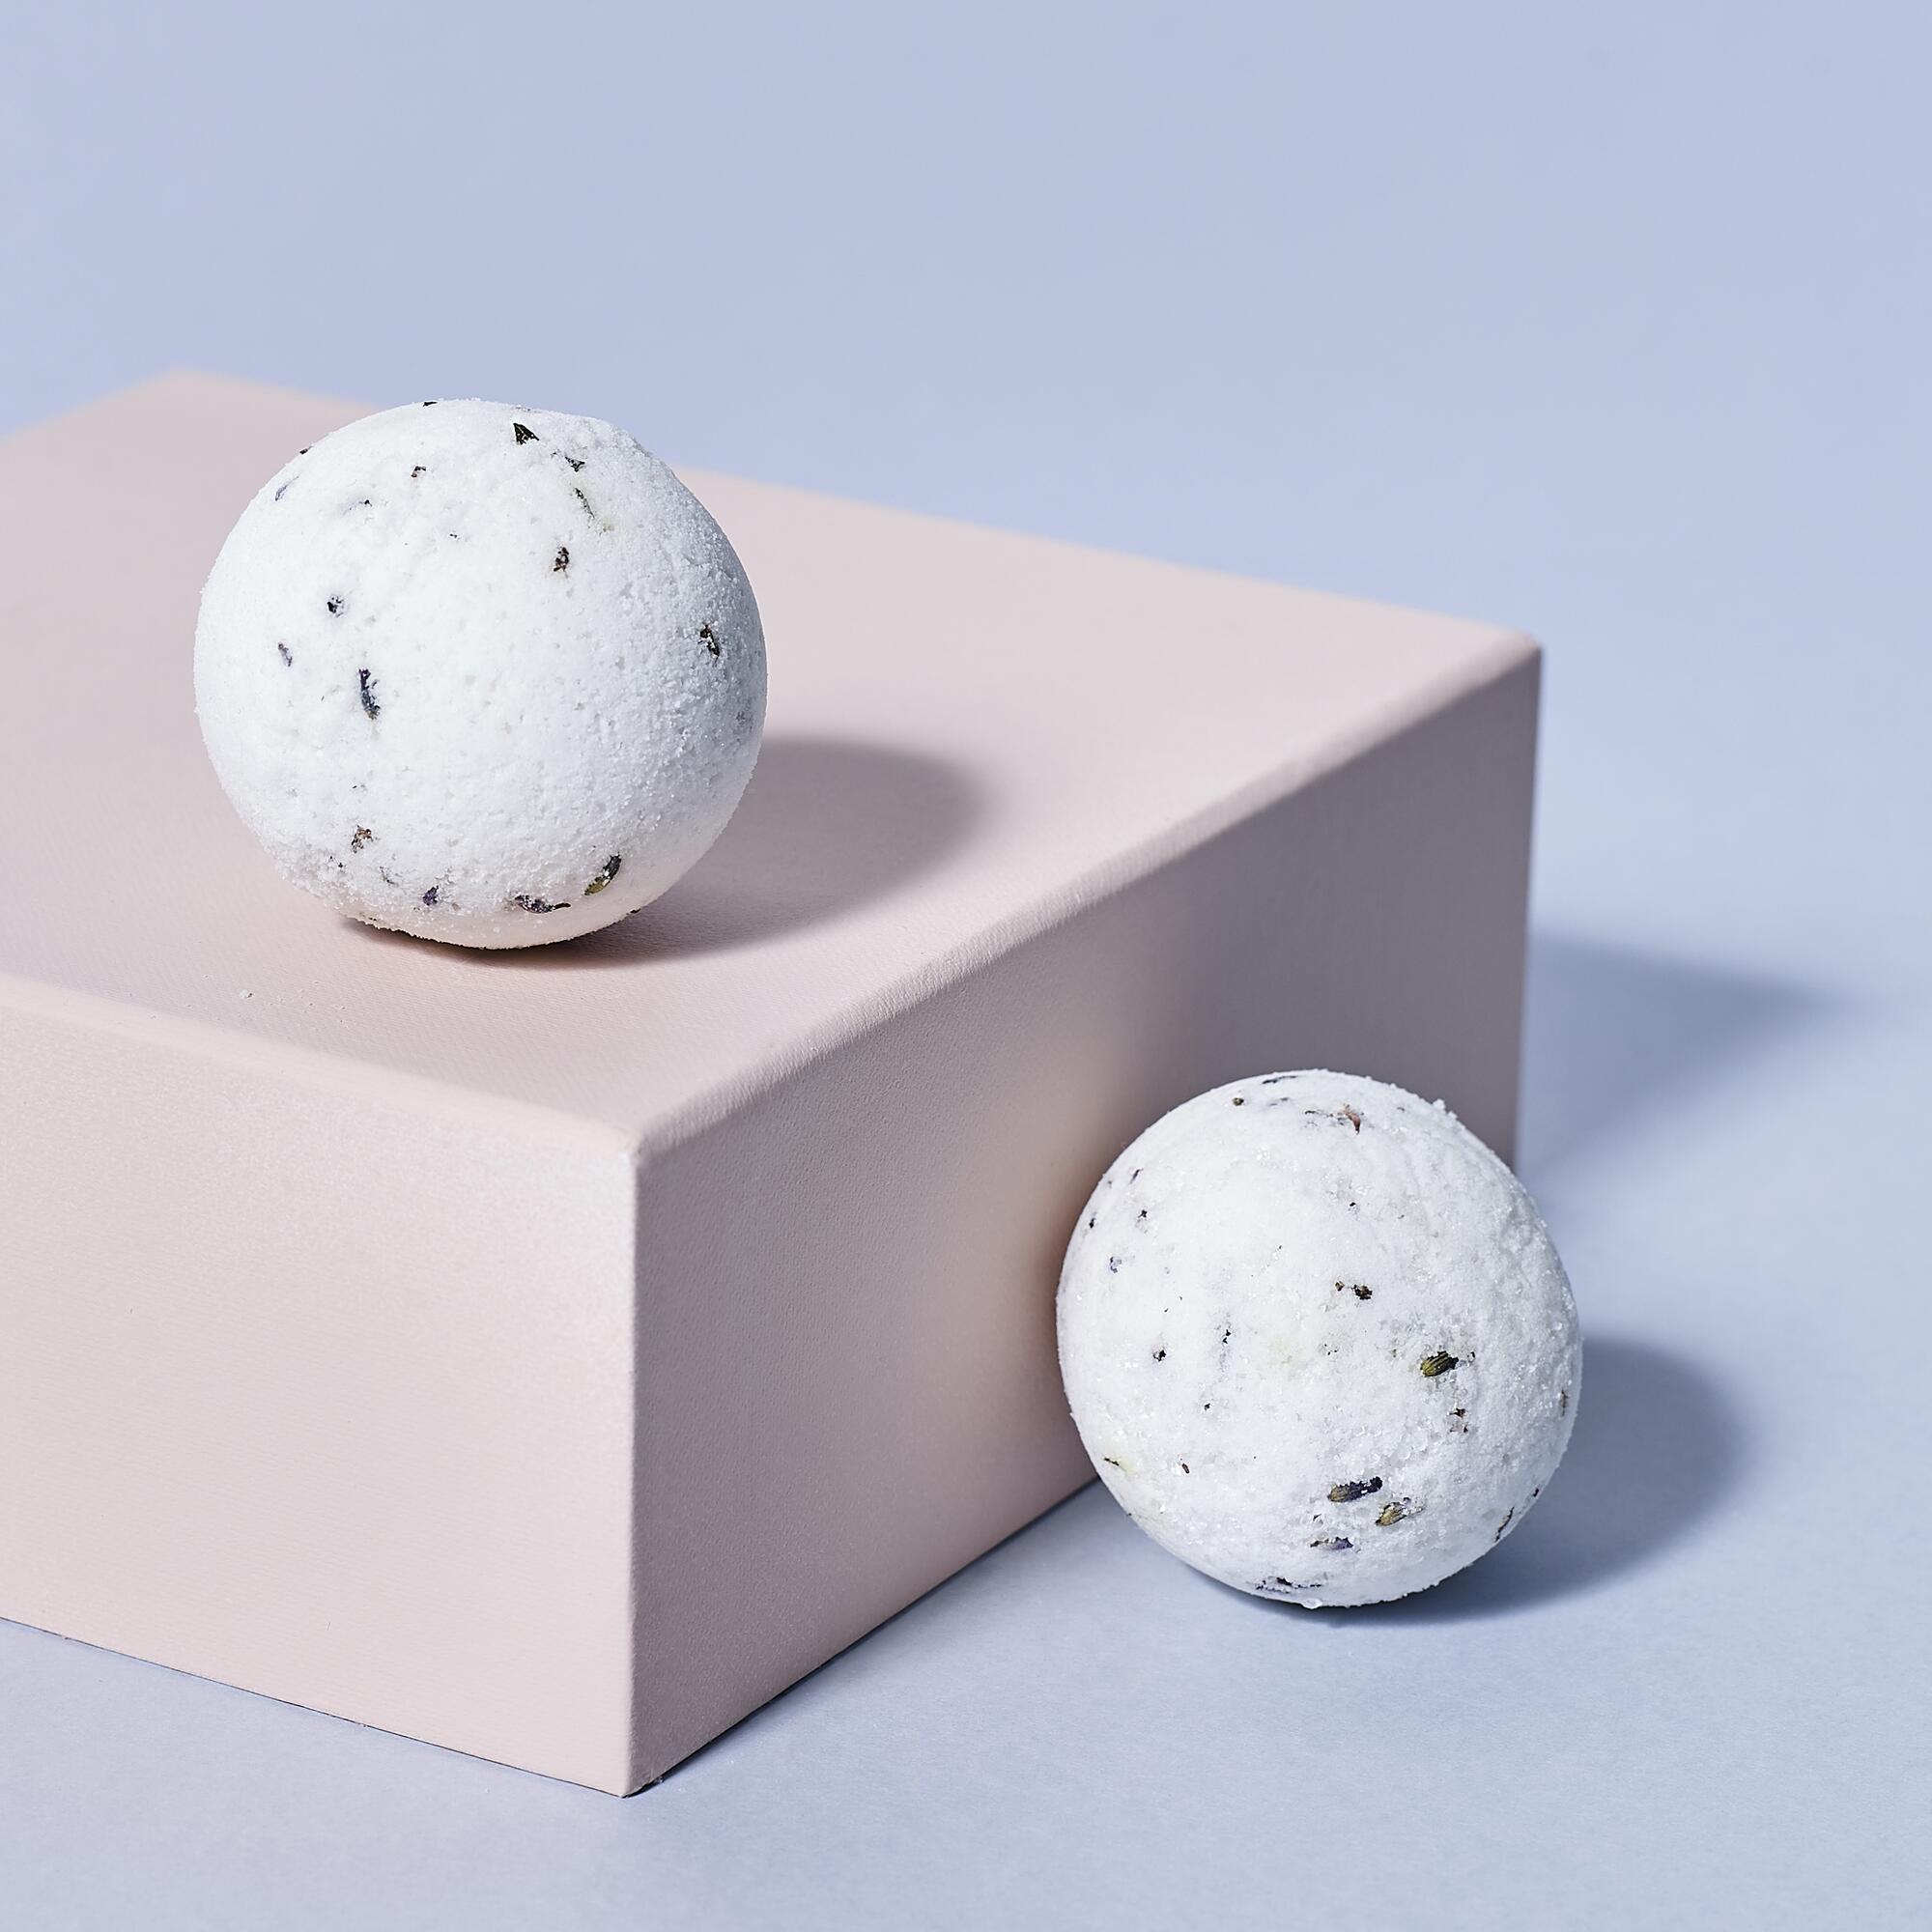 KULA LAWENDA - Soap Workshop | JestemSlow.pl